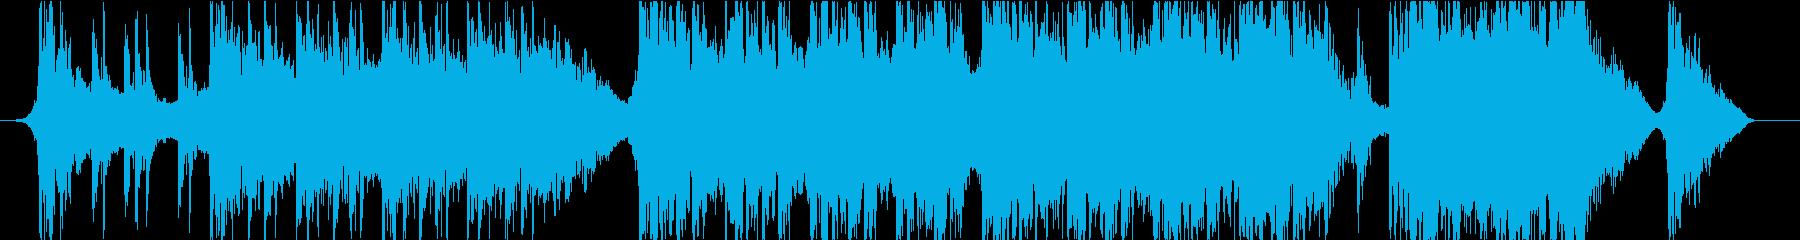 Cinematic Rock Musicの再生済みの波形